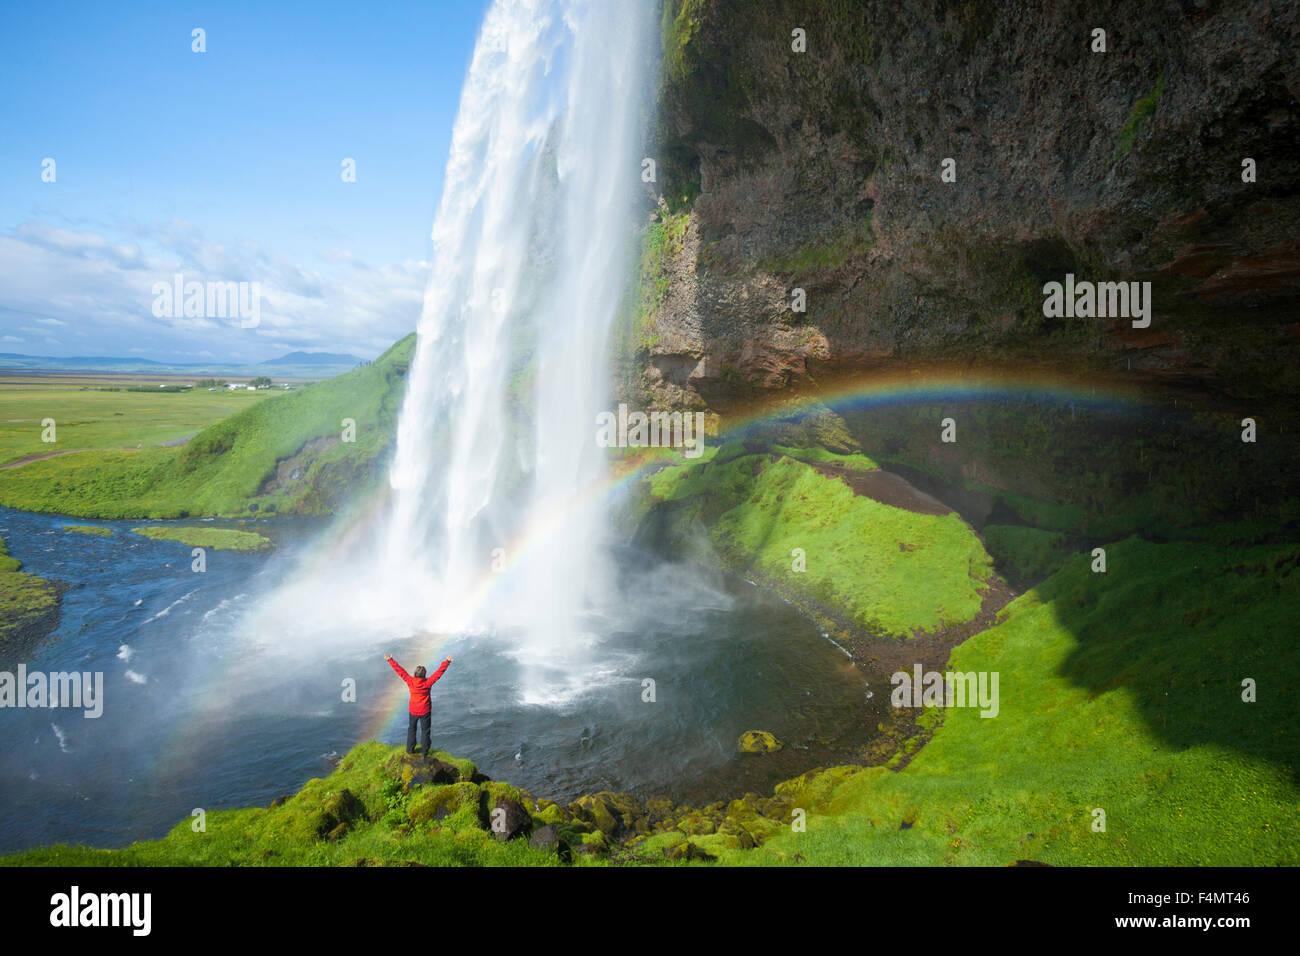 Live Falls Wallpaper Free Download Person And Rainbow Beneath 60m High Seljalandsfoss